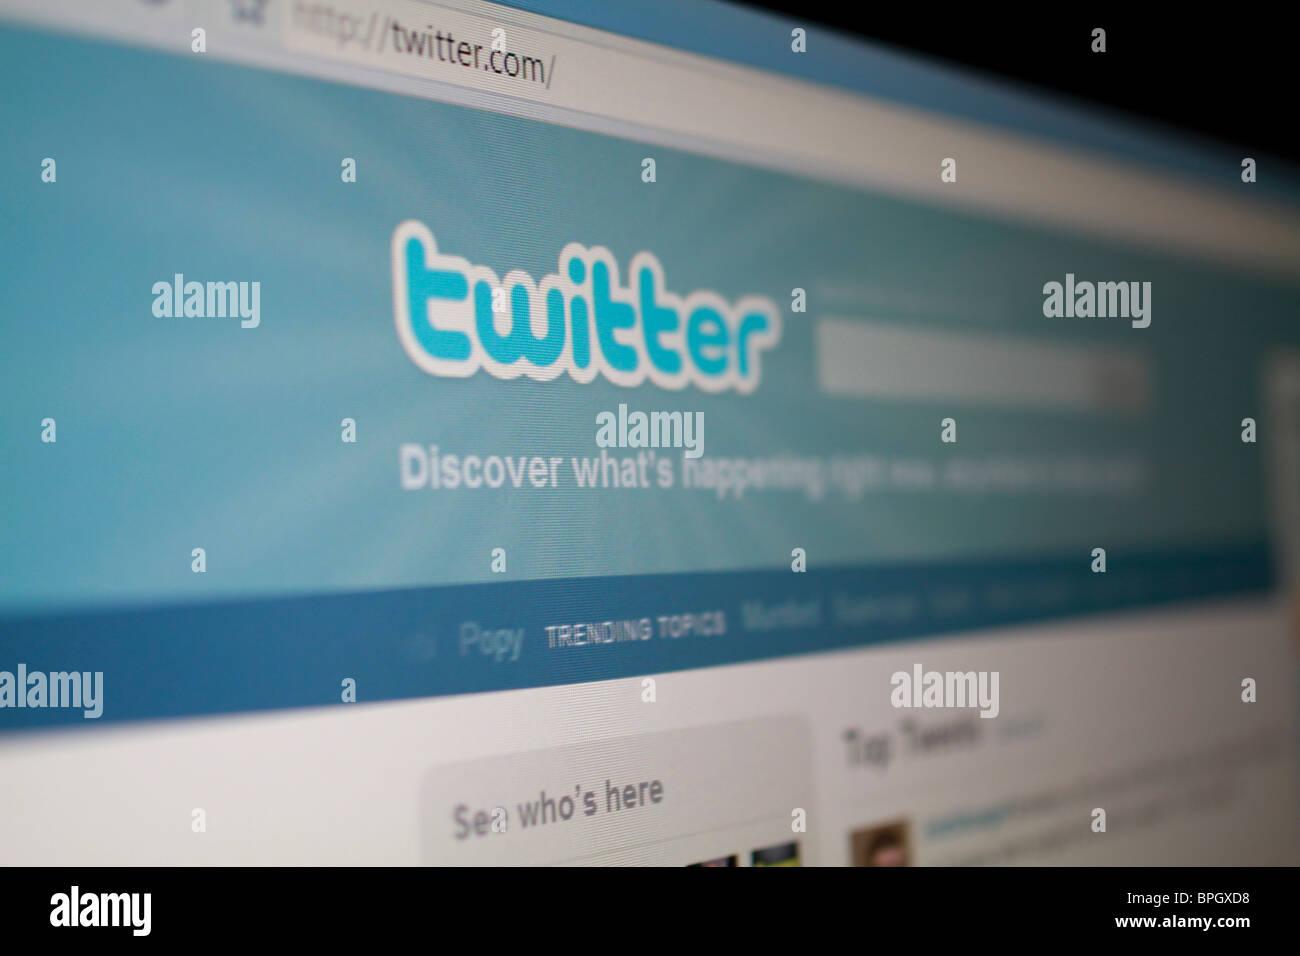 Twitter social networking website splash screen and logo Stock Photo